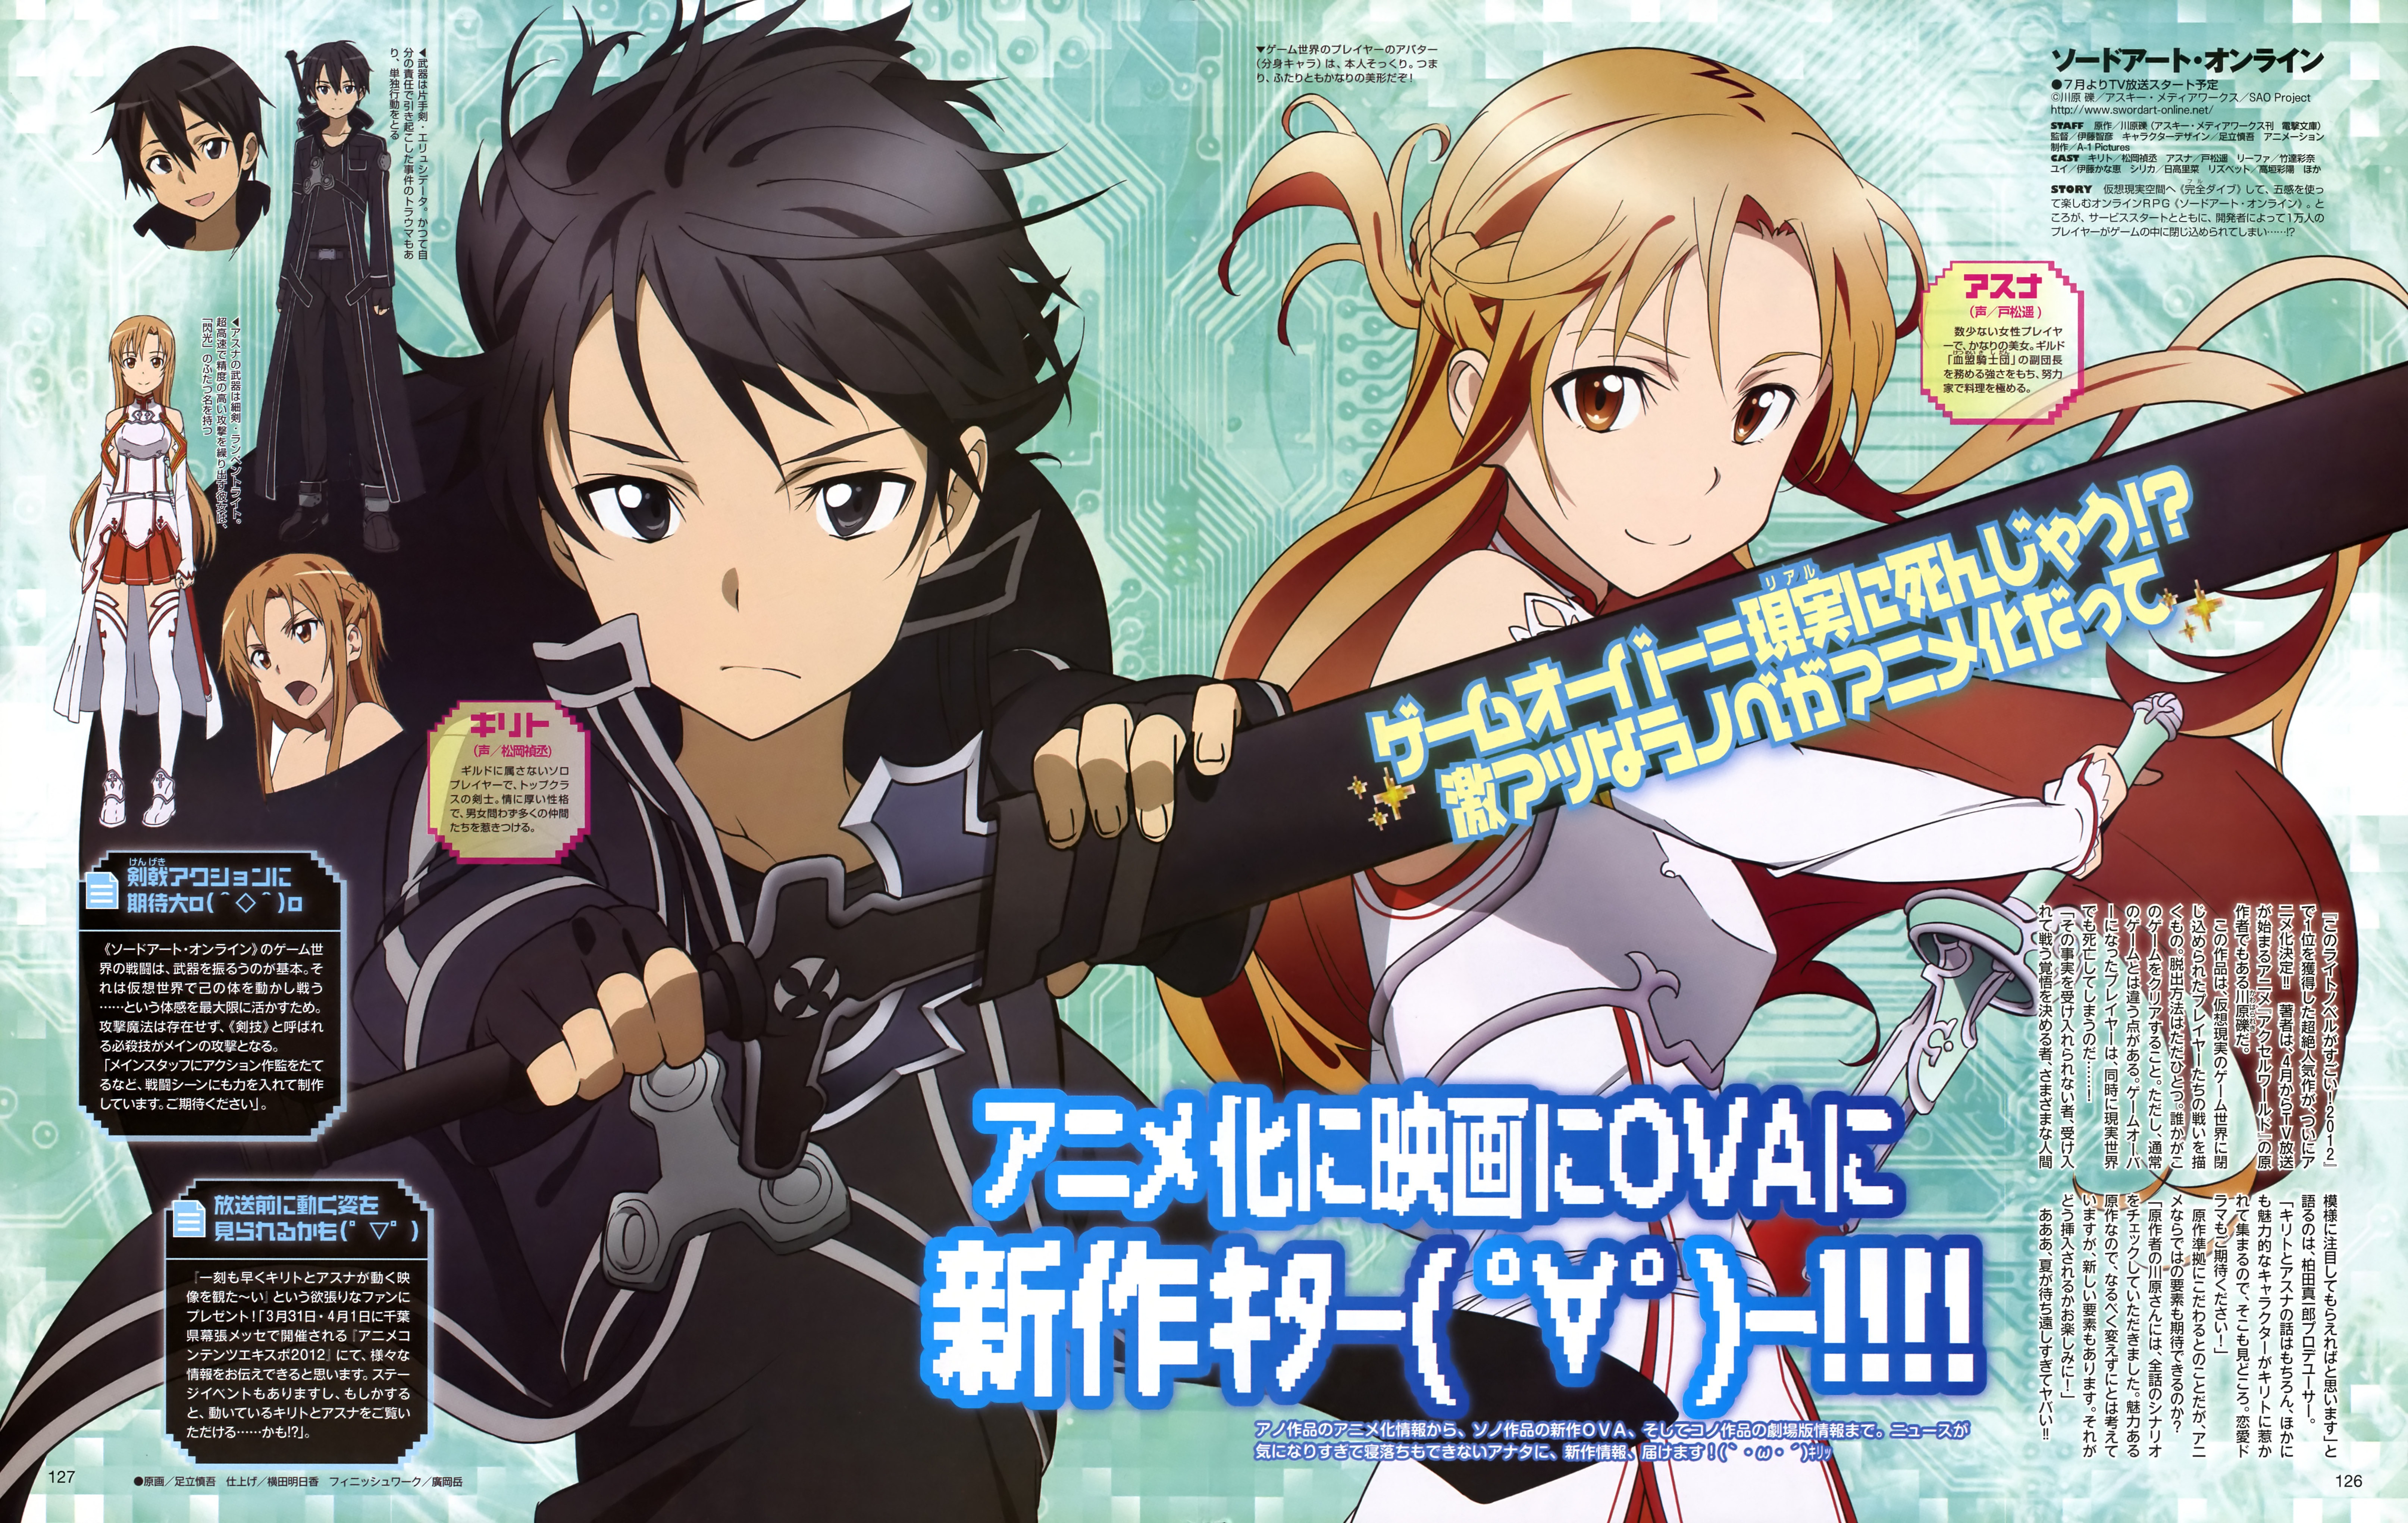 Zero Anime Sword Art Online View Fullsize Sword Art Online